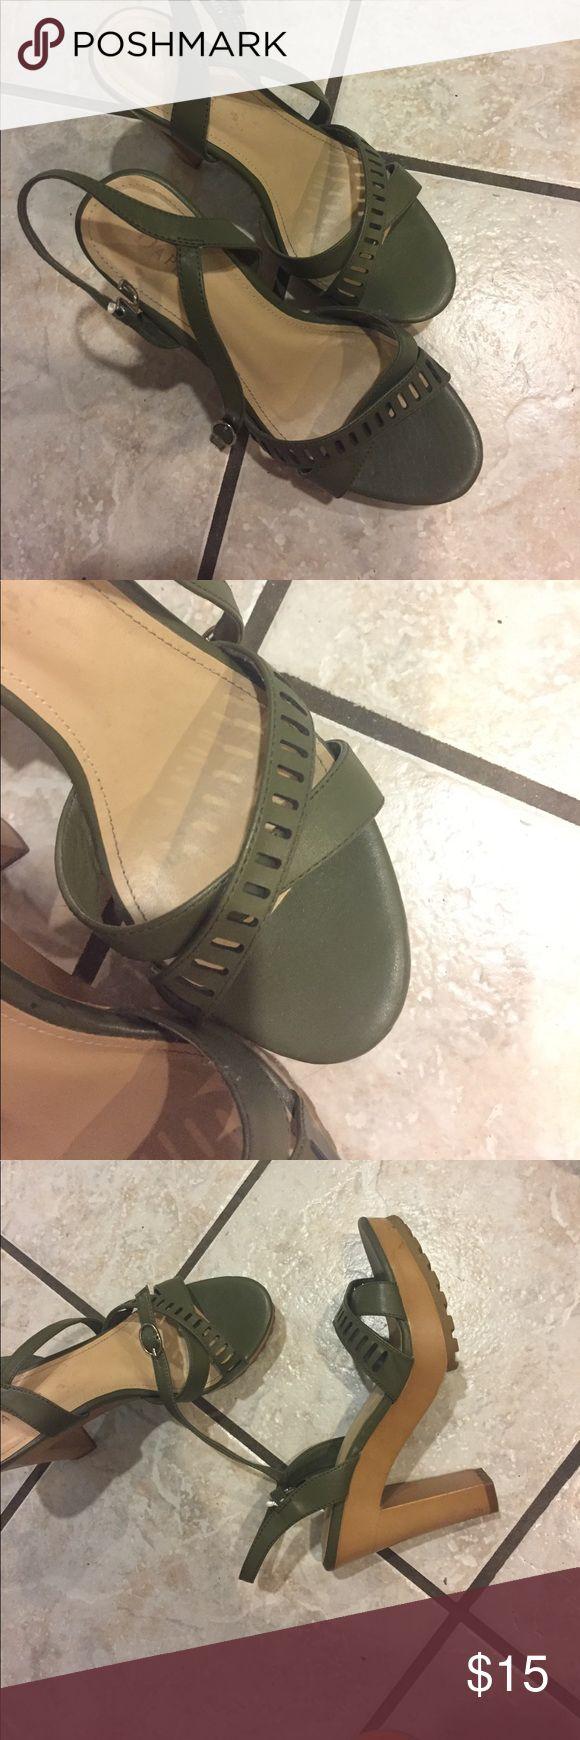 Dark green High heels High heel shoes, deep green color. Worn literally twice Daphne Shoes Platforms